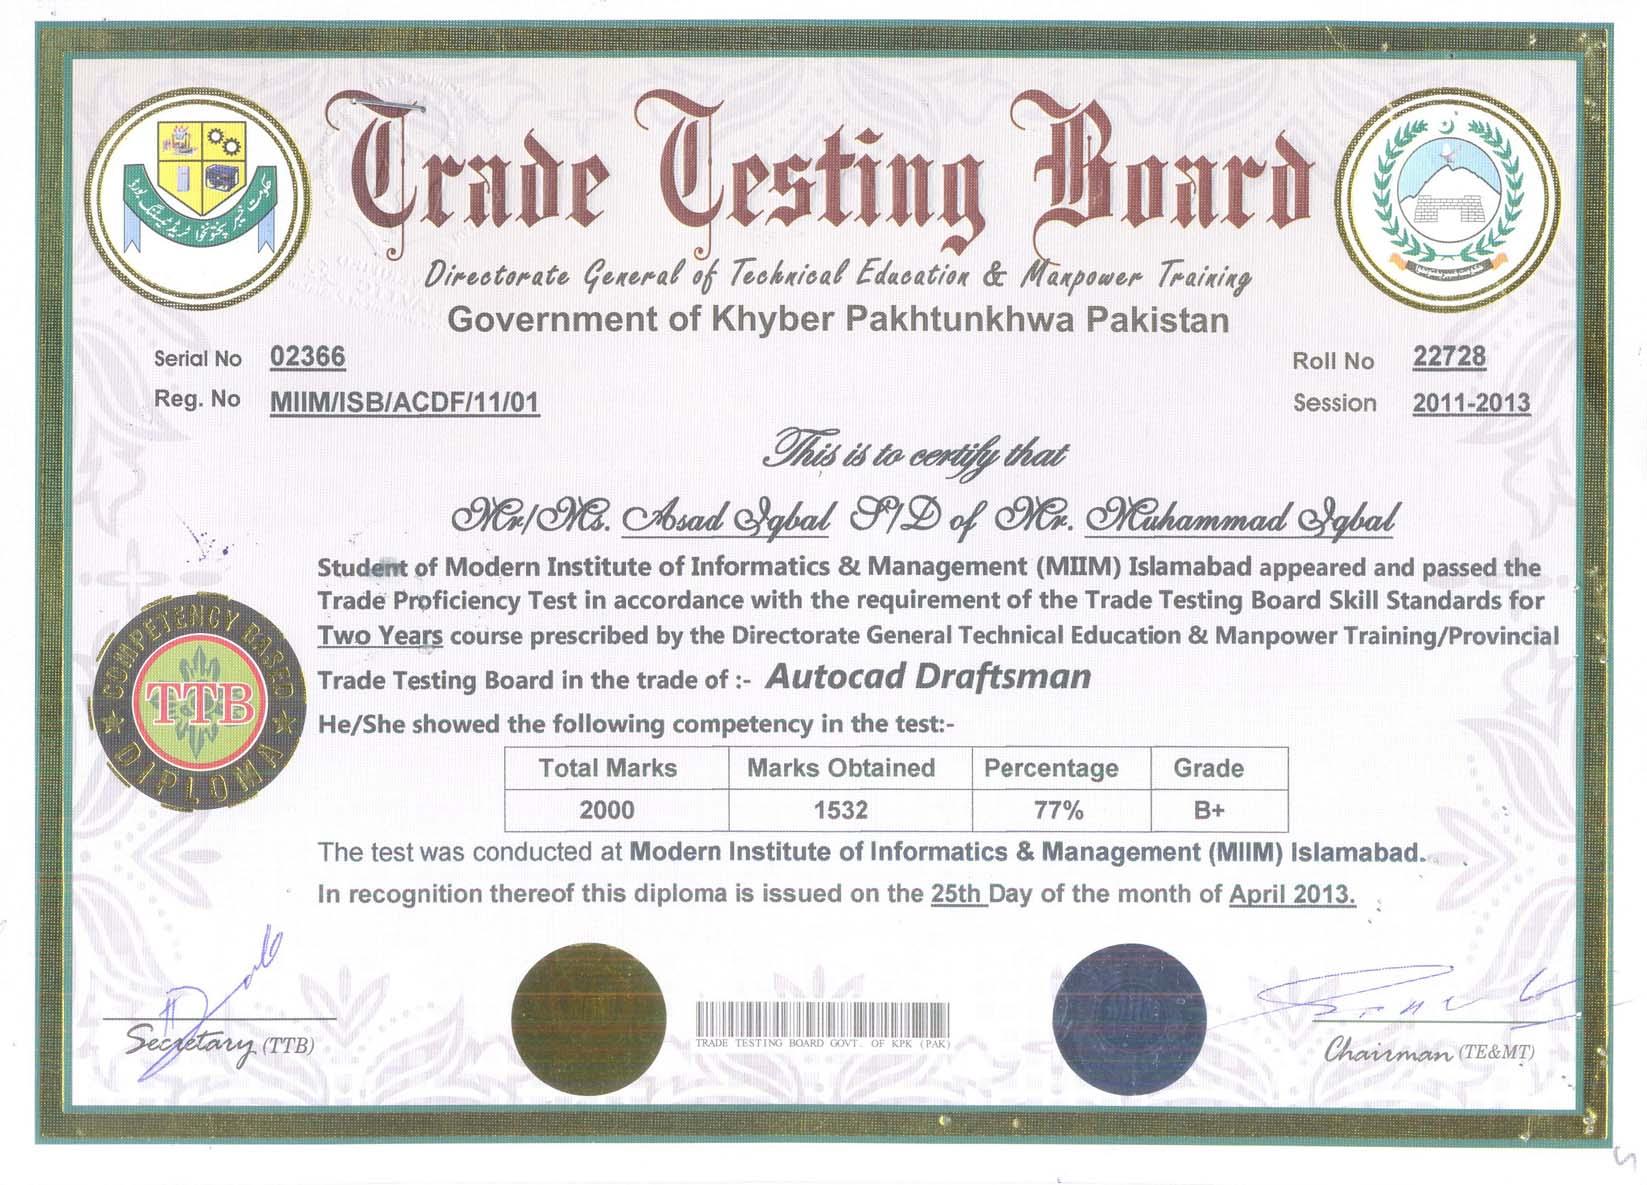 saudi embassy attested sample diplomas the miim islamabad